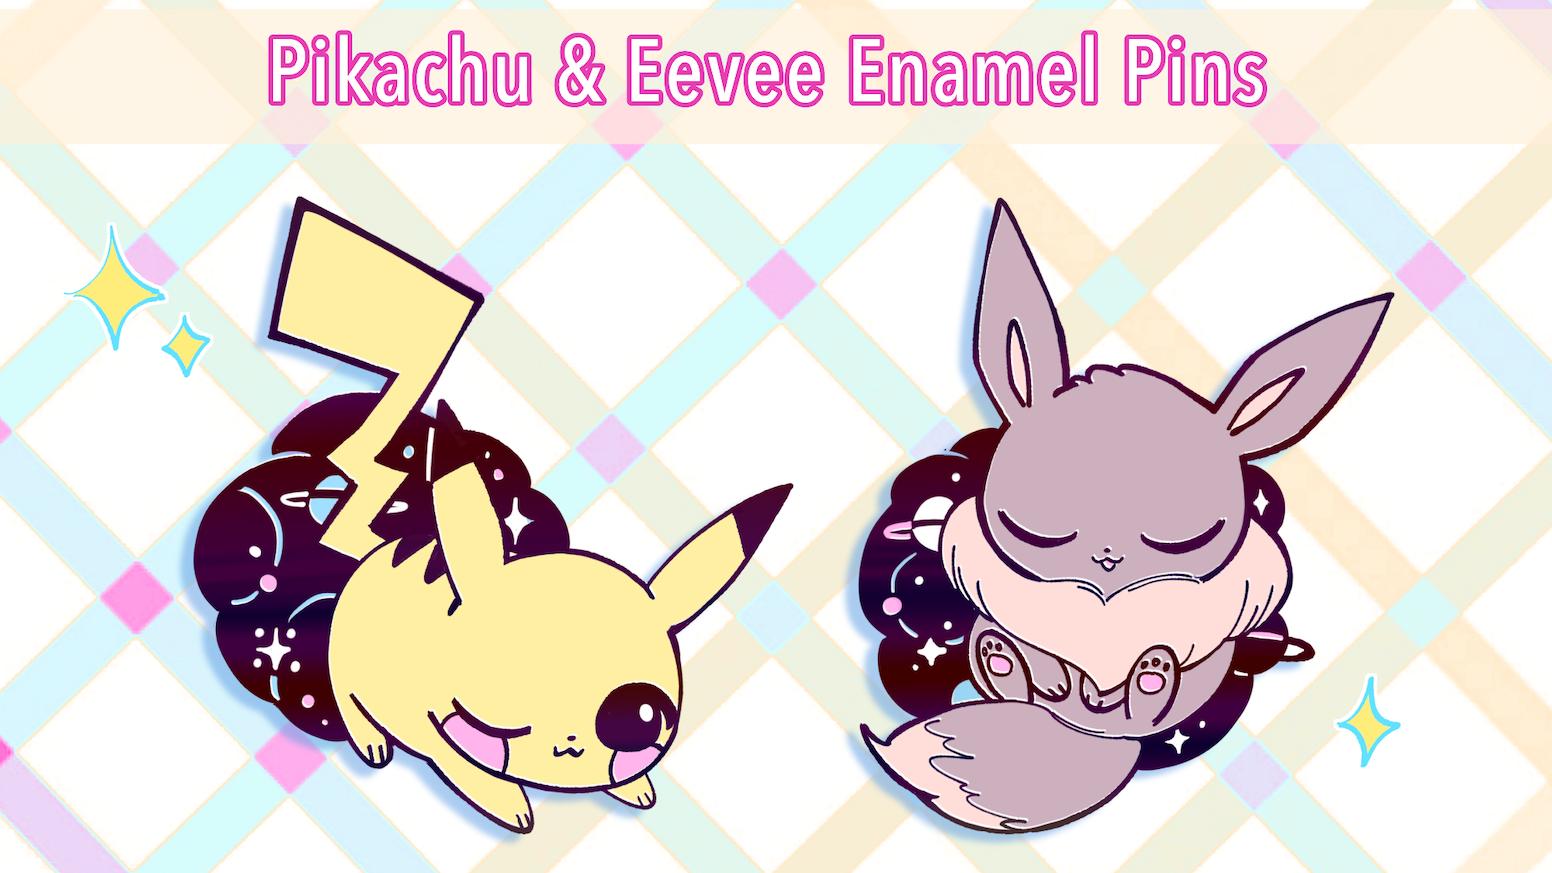 Pikachu And Eevee Galaxy Pins By Isabella Reeves Kickstarter